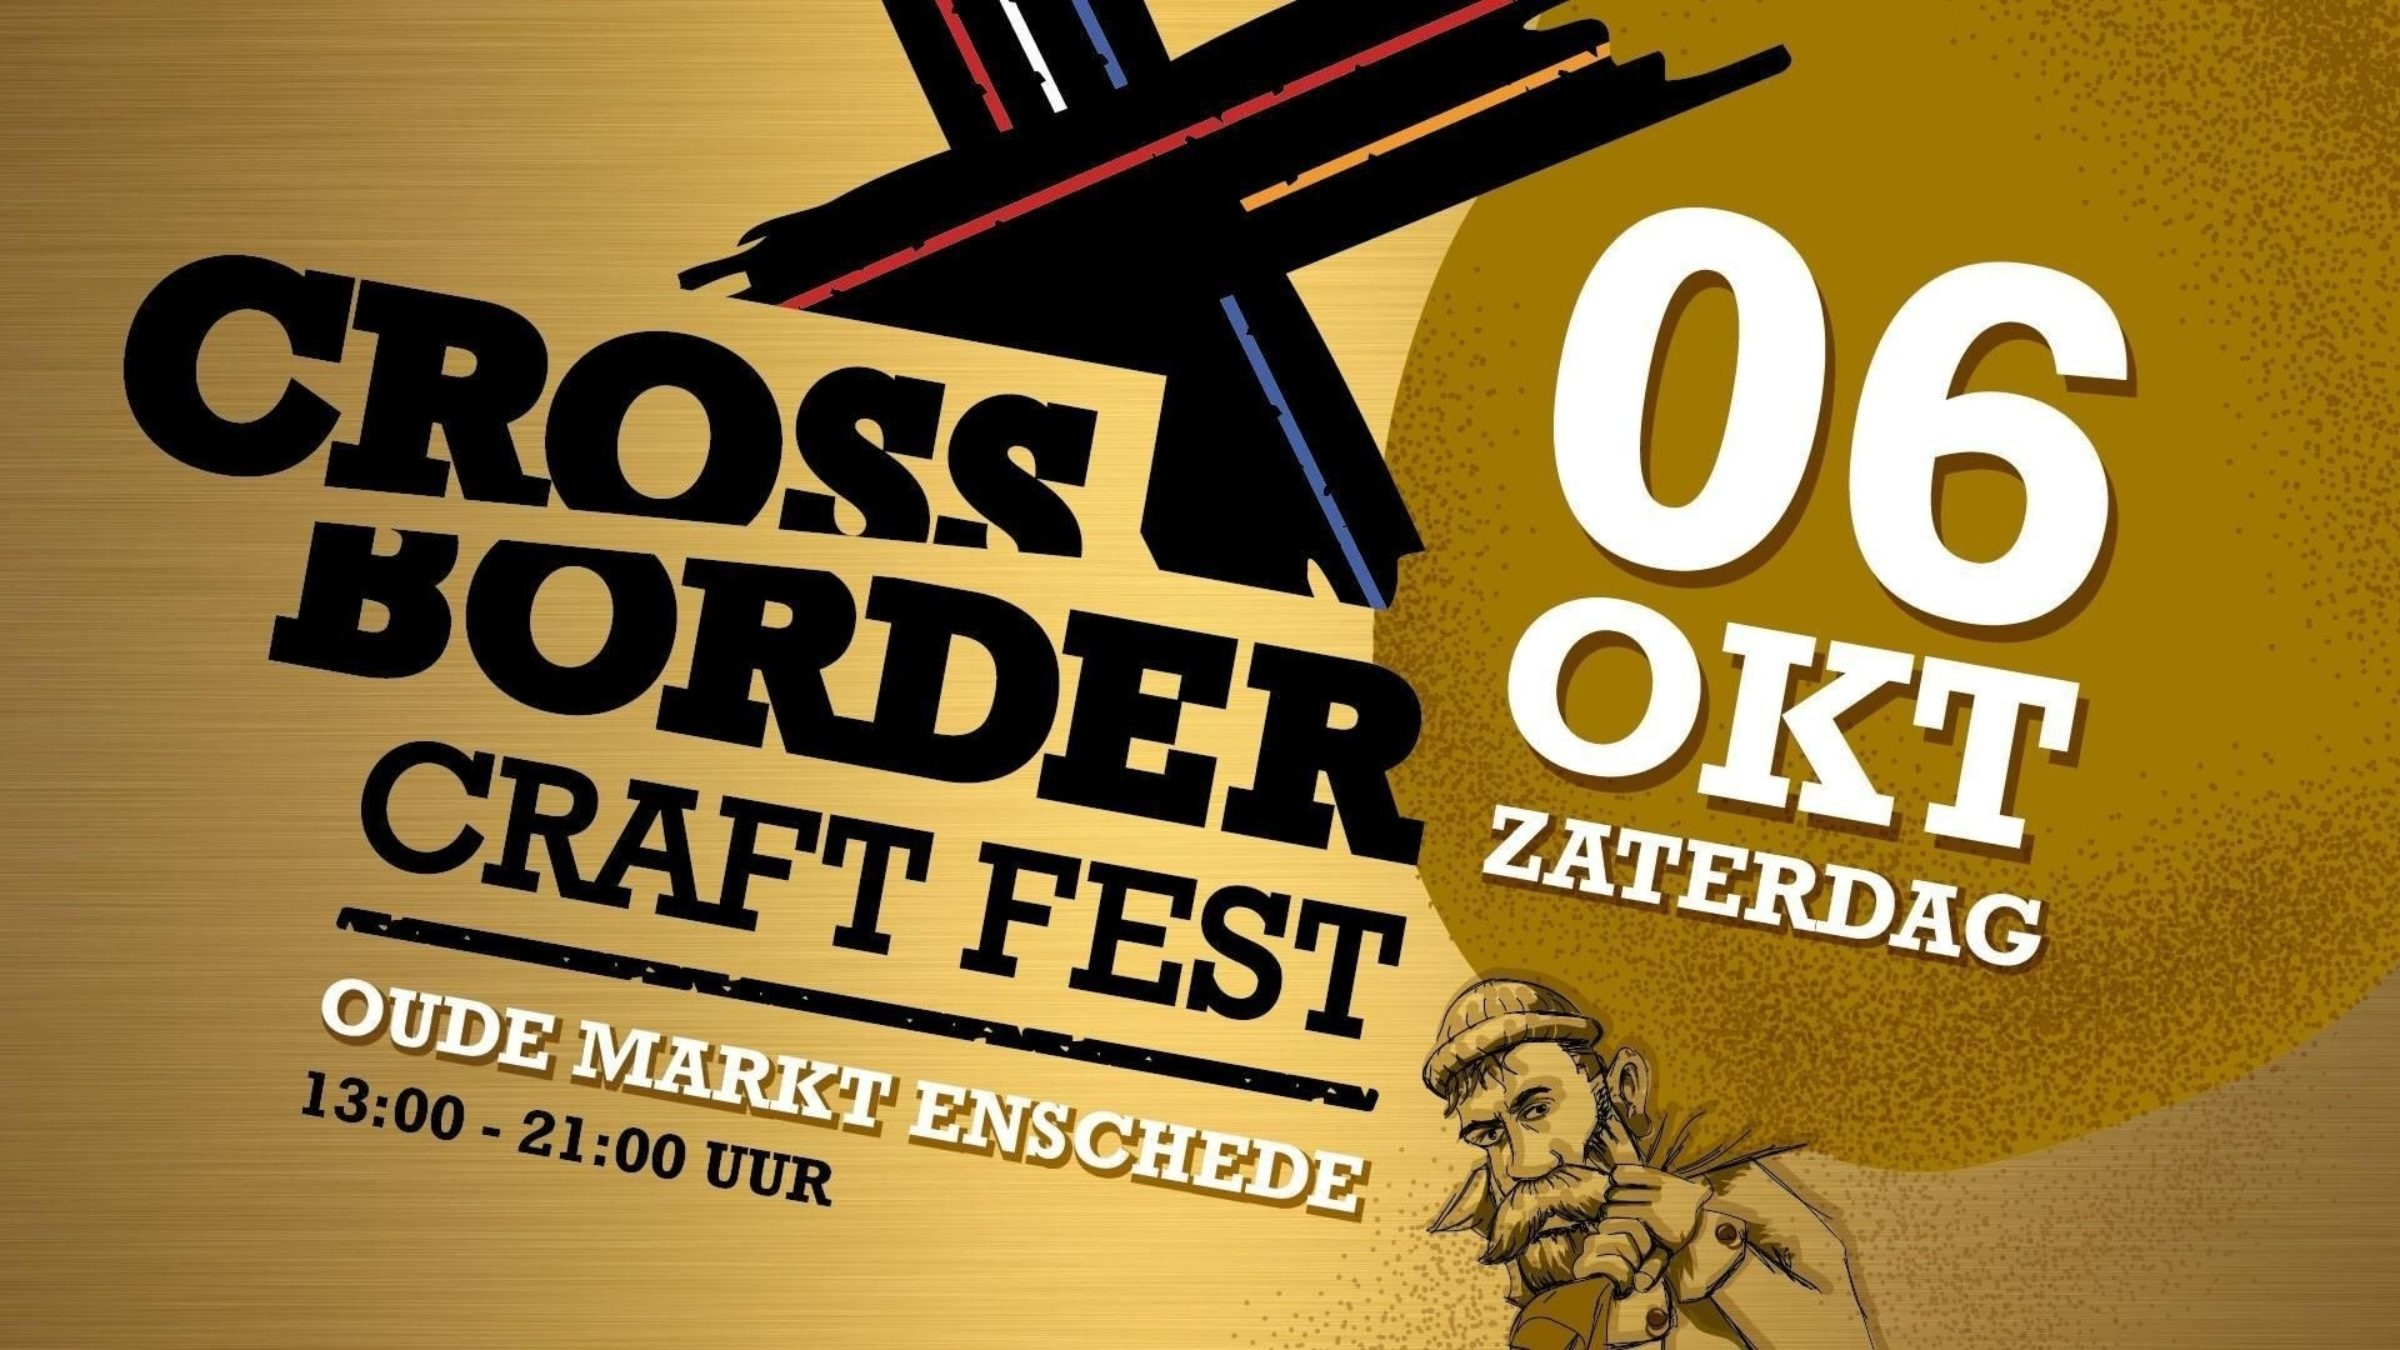 Cross border craft fest 1324 1536234190 35ht2sopij